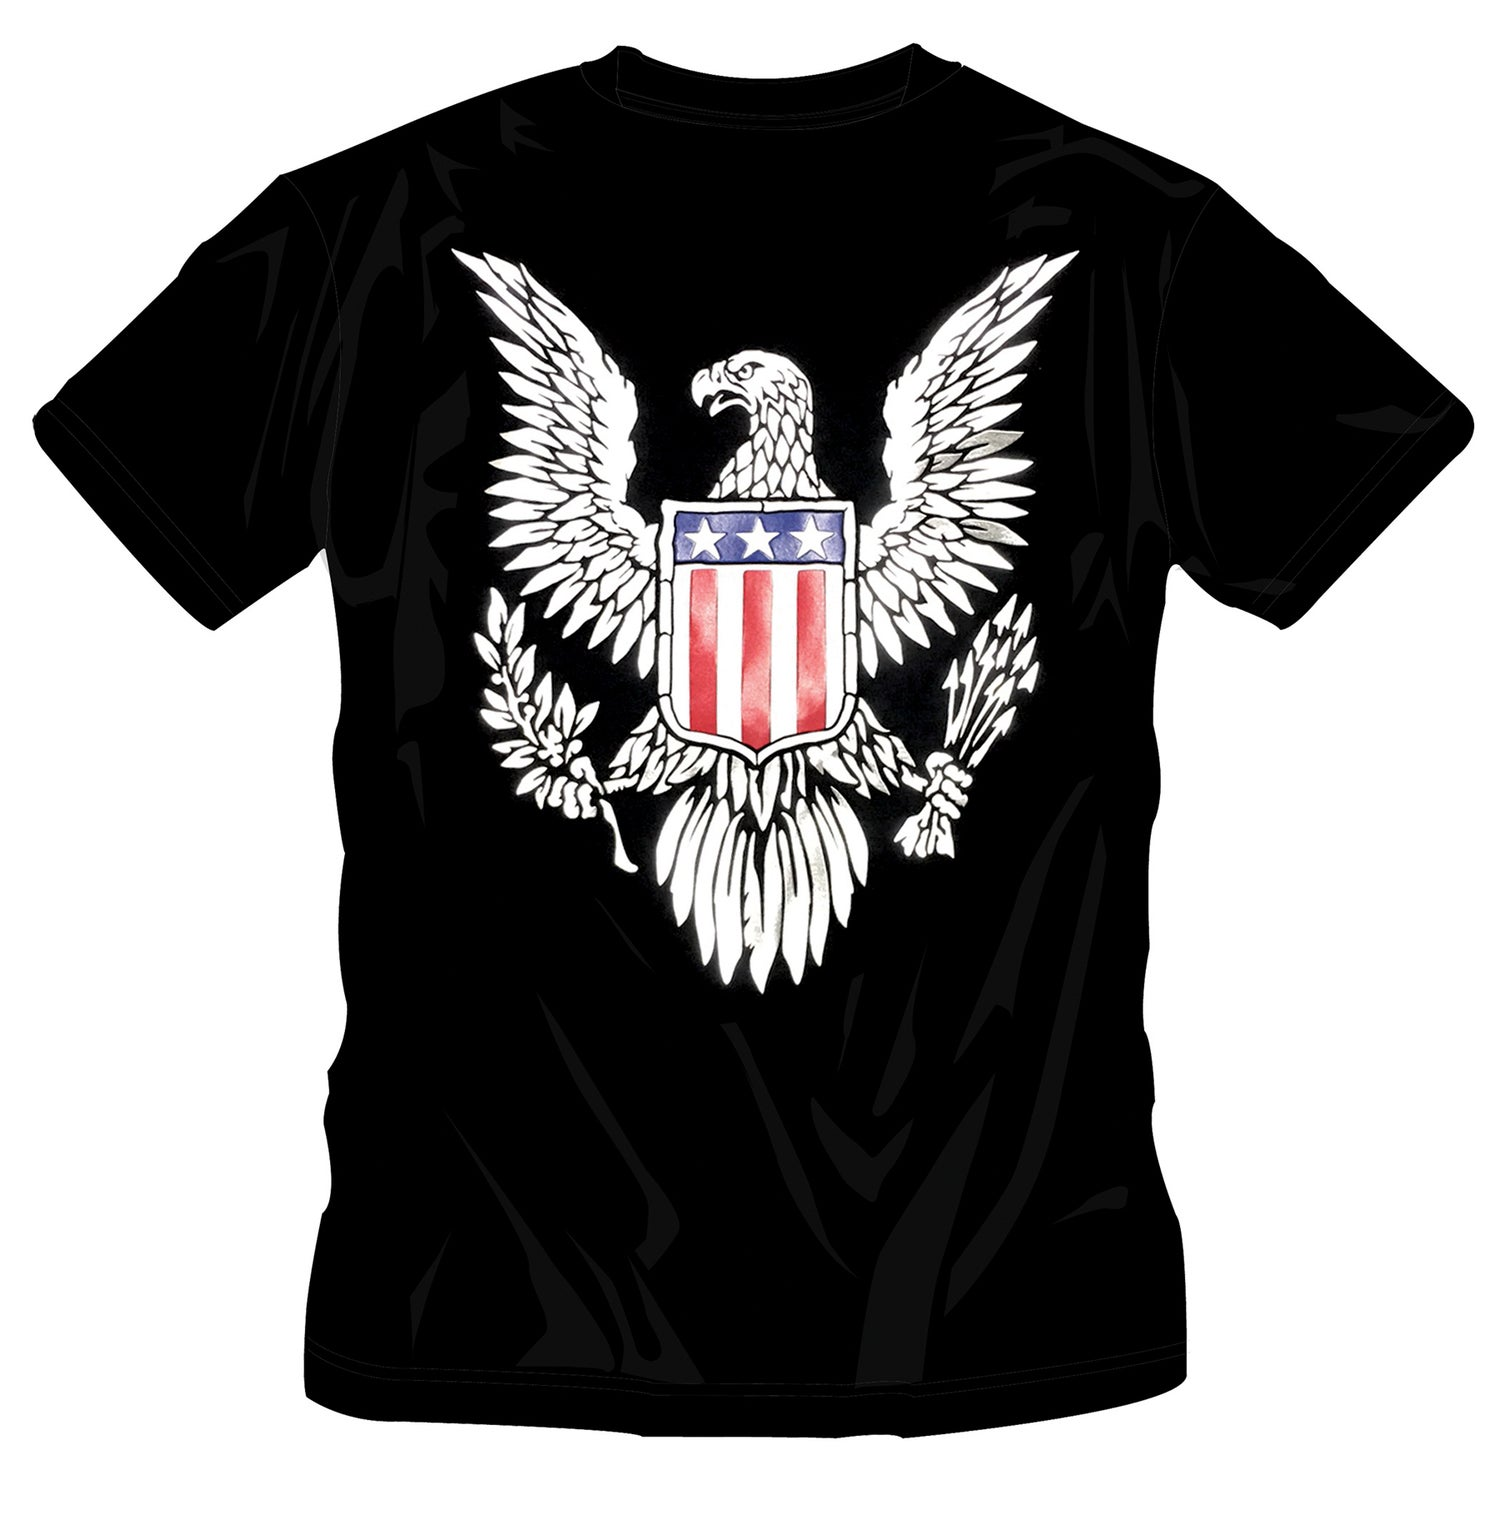 Image of #13 EAGLE AMERICA TSHIRT